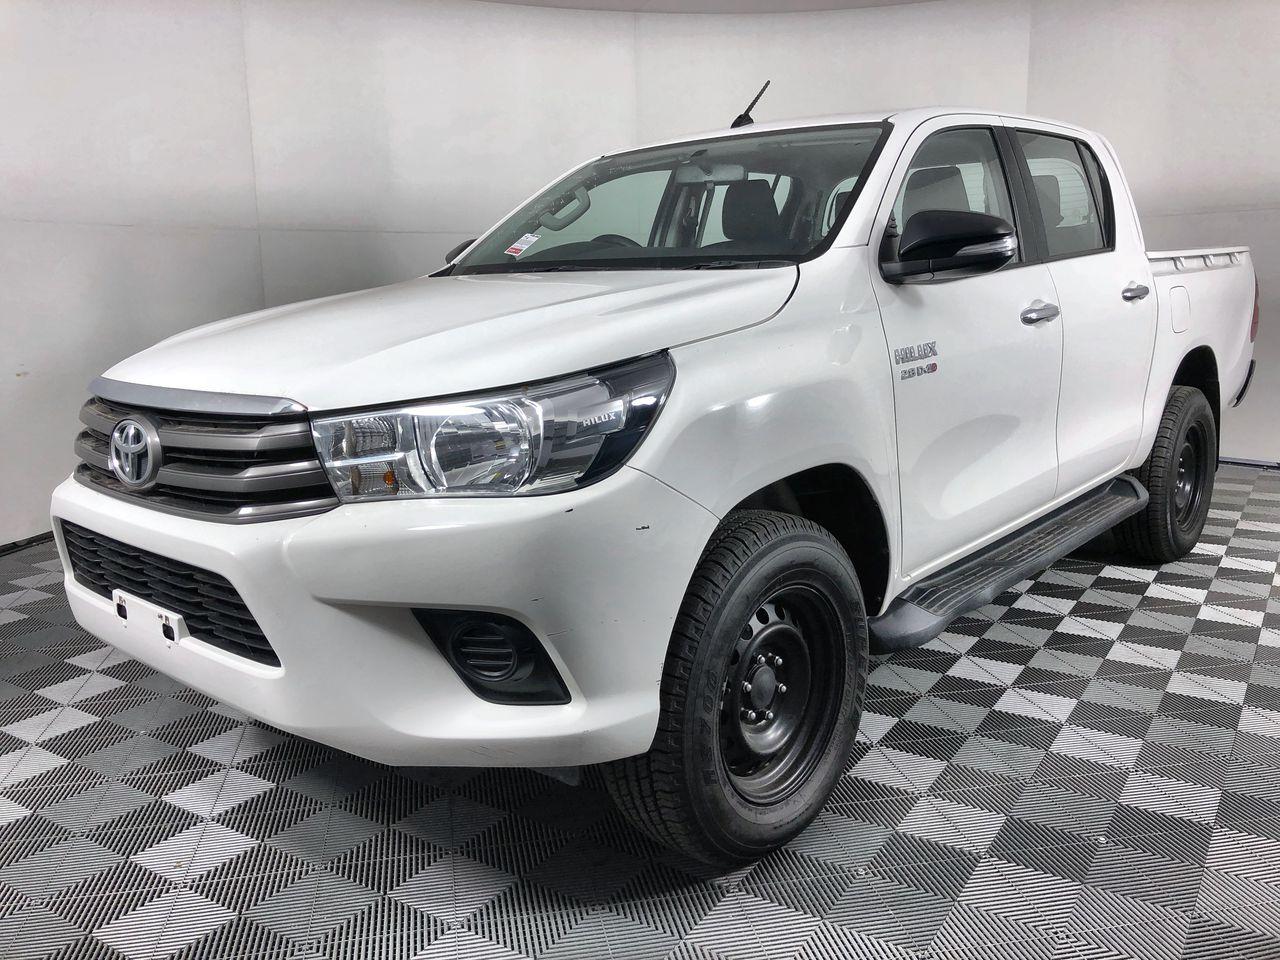 2017 Toyota Hilux 2.8T/D Auto 4WD 81,102 km's